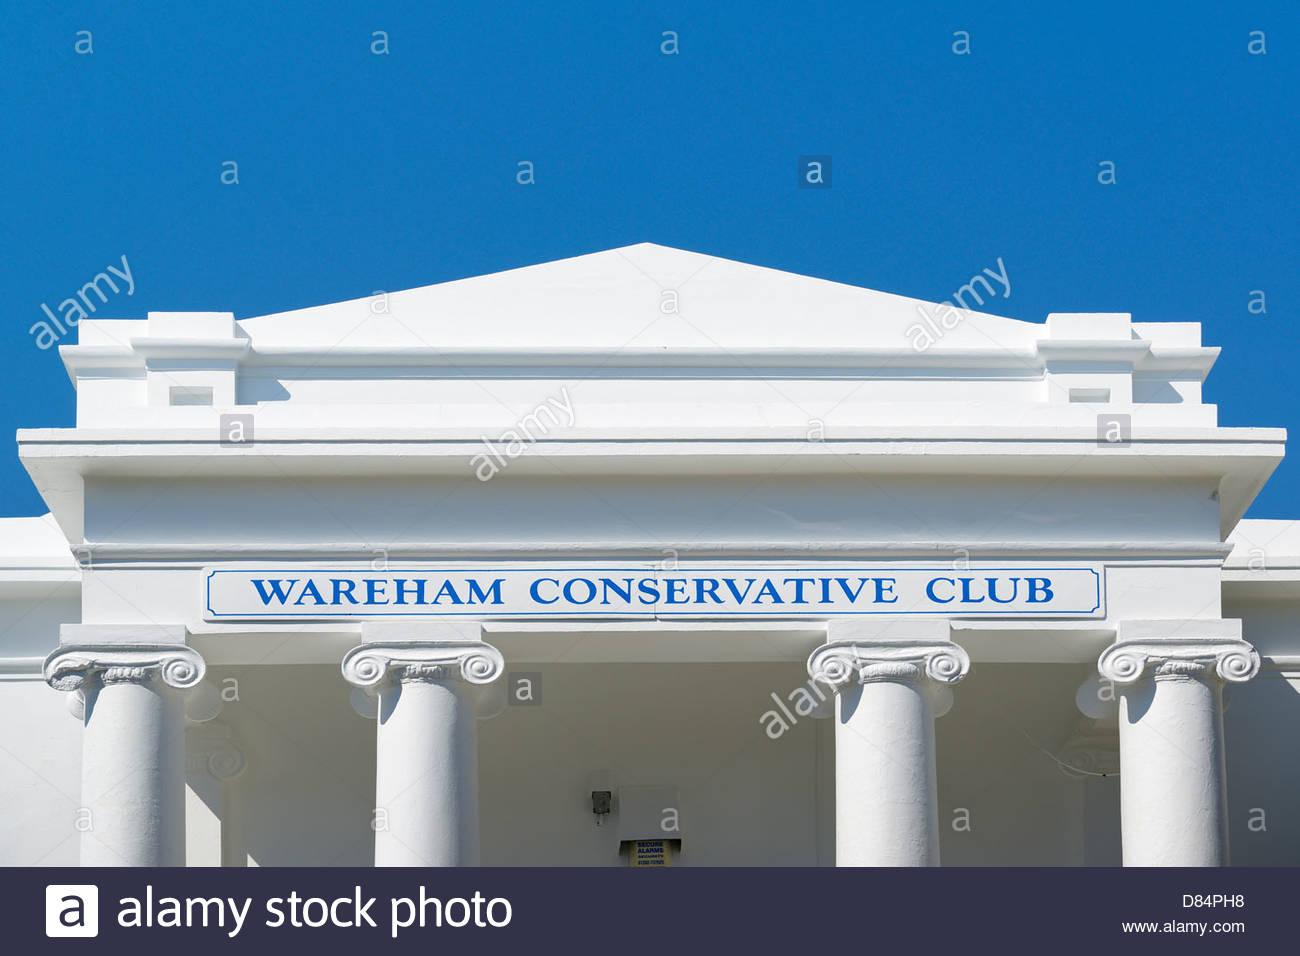 Wareham Conservative club portico, Wareham, Dorset England UK - Stock Image